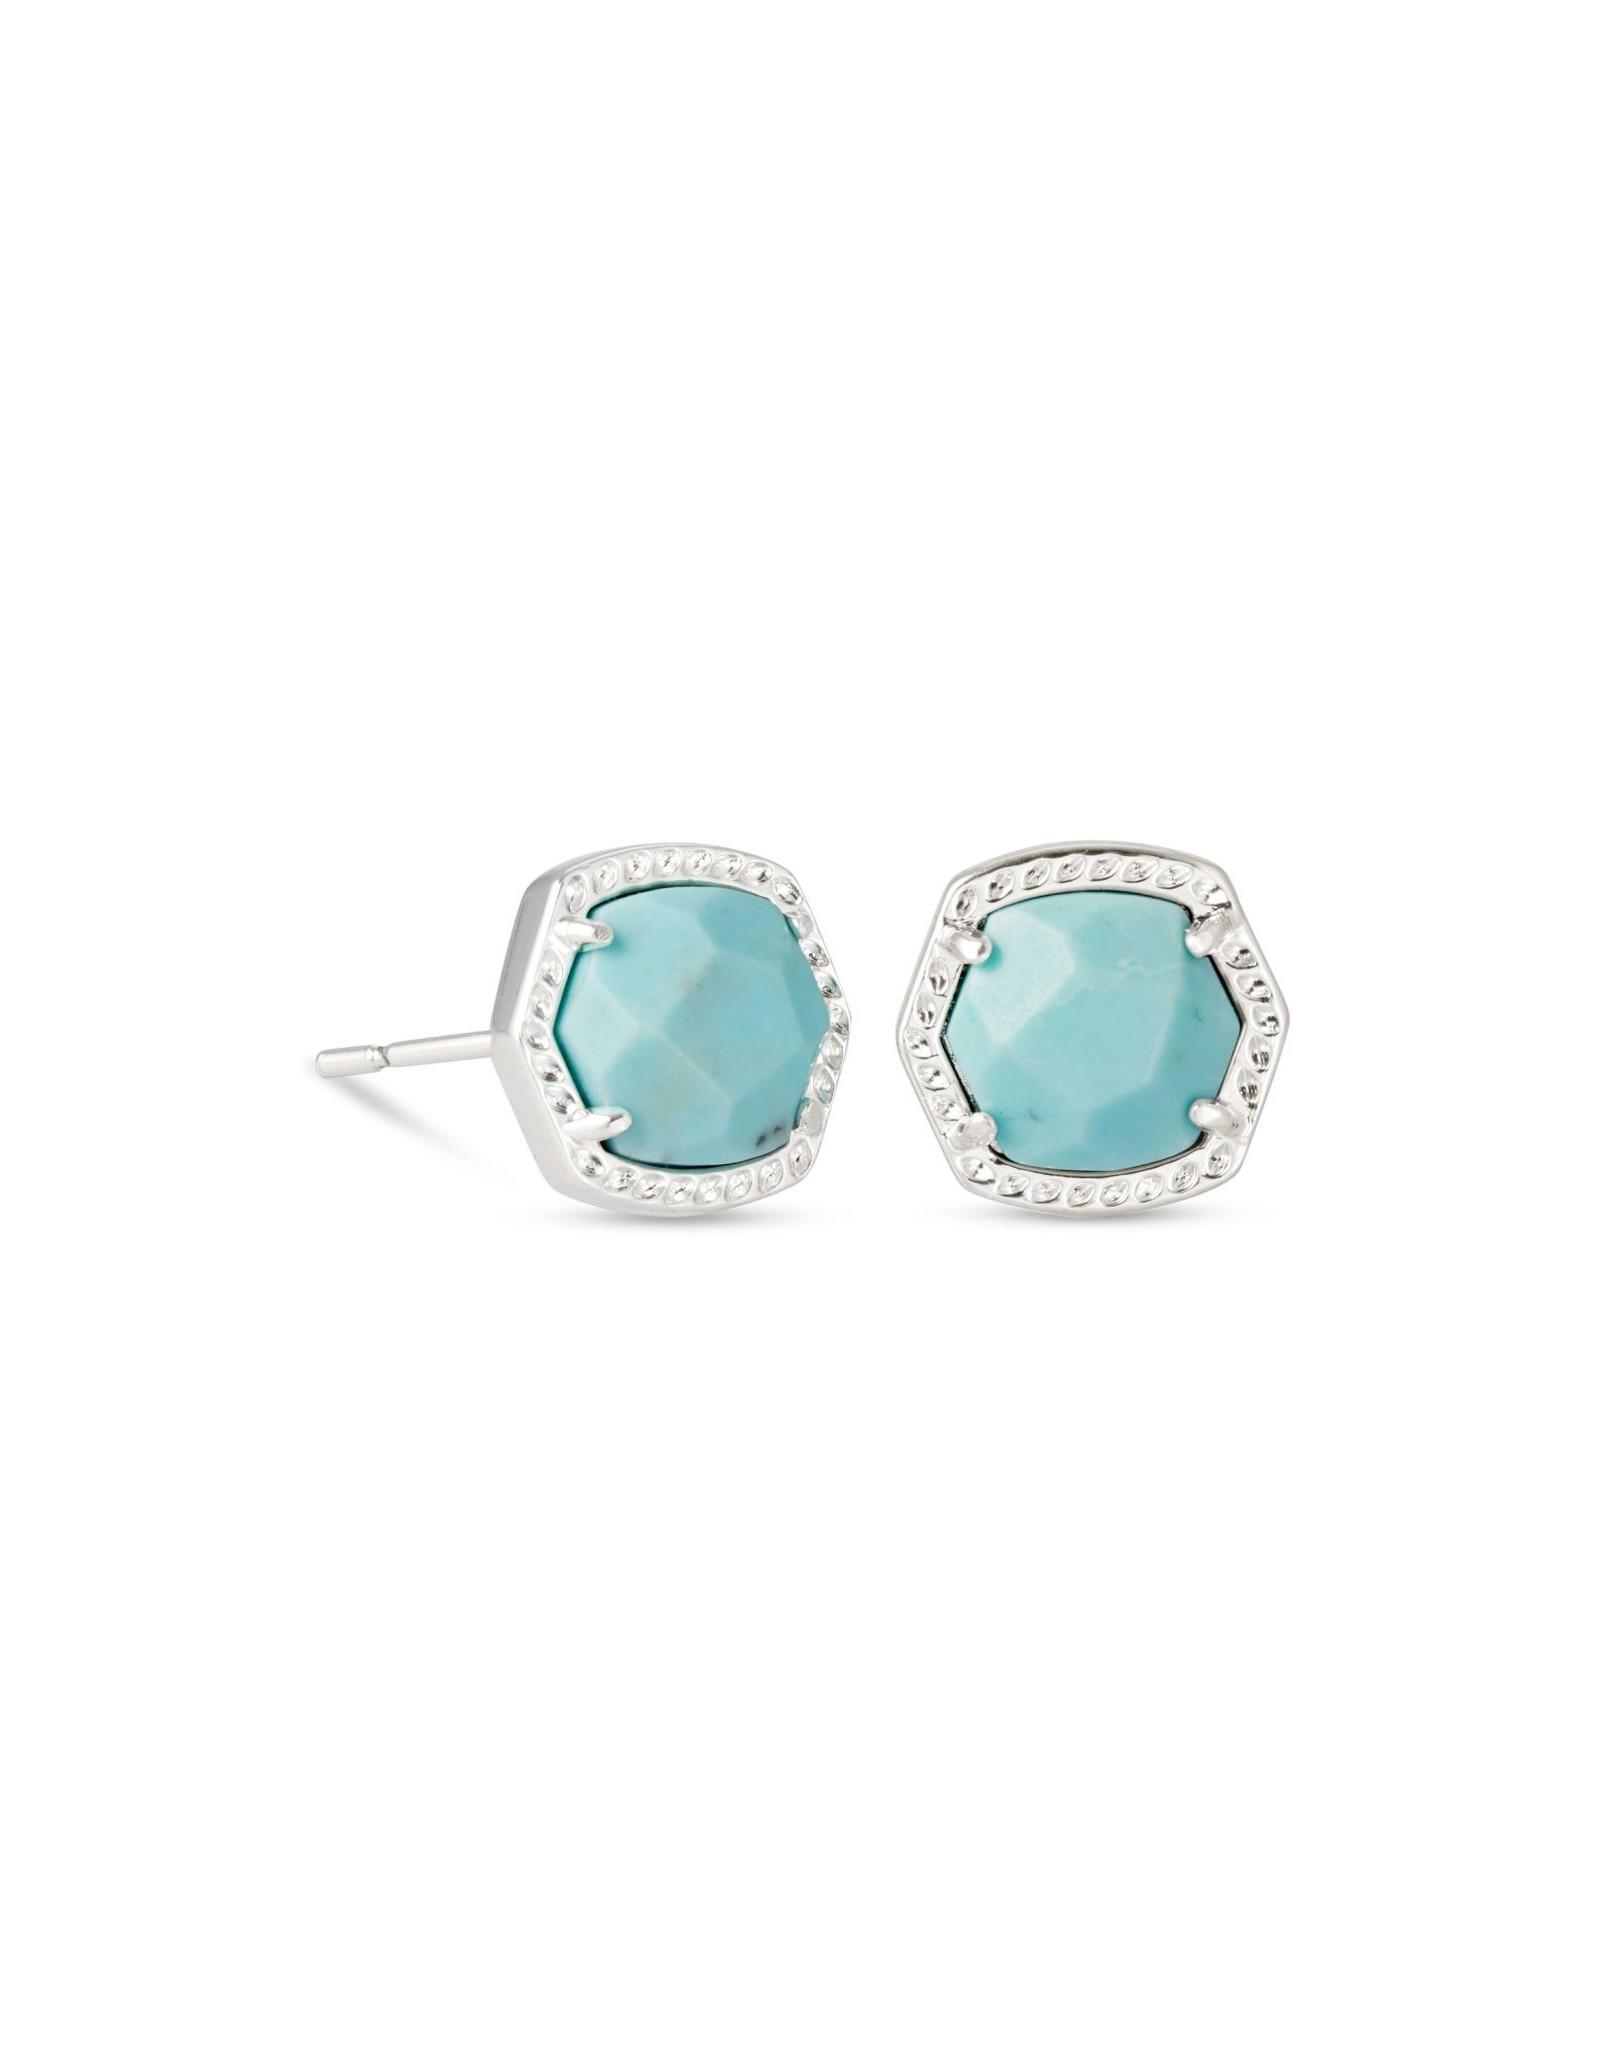 Kendra Scott Davie Stud Earring - Lt Blue Magnesite/Rhodium